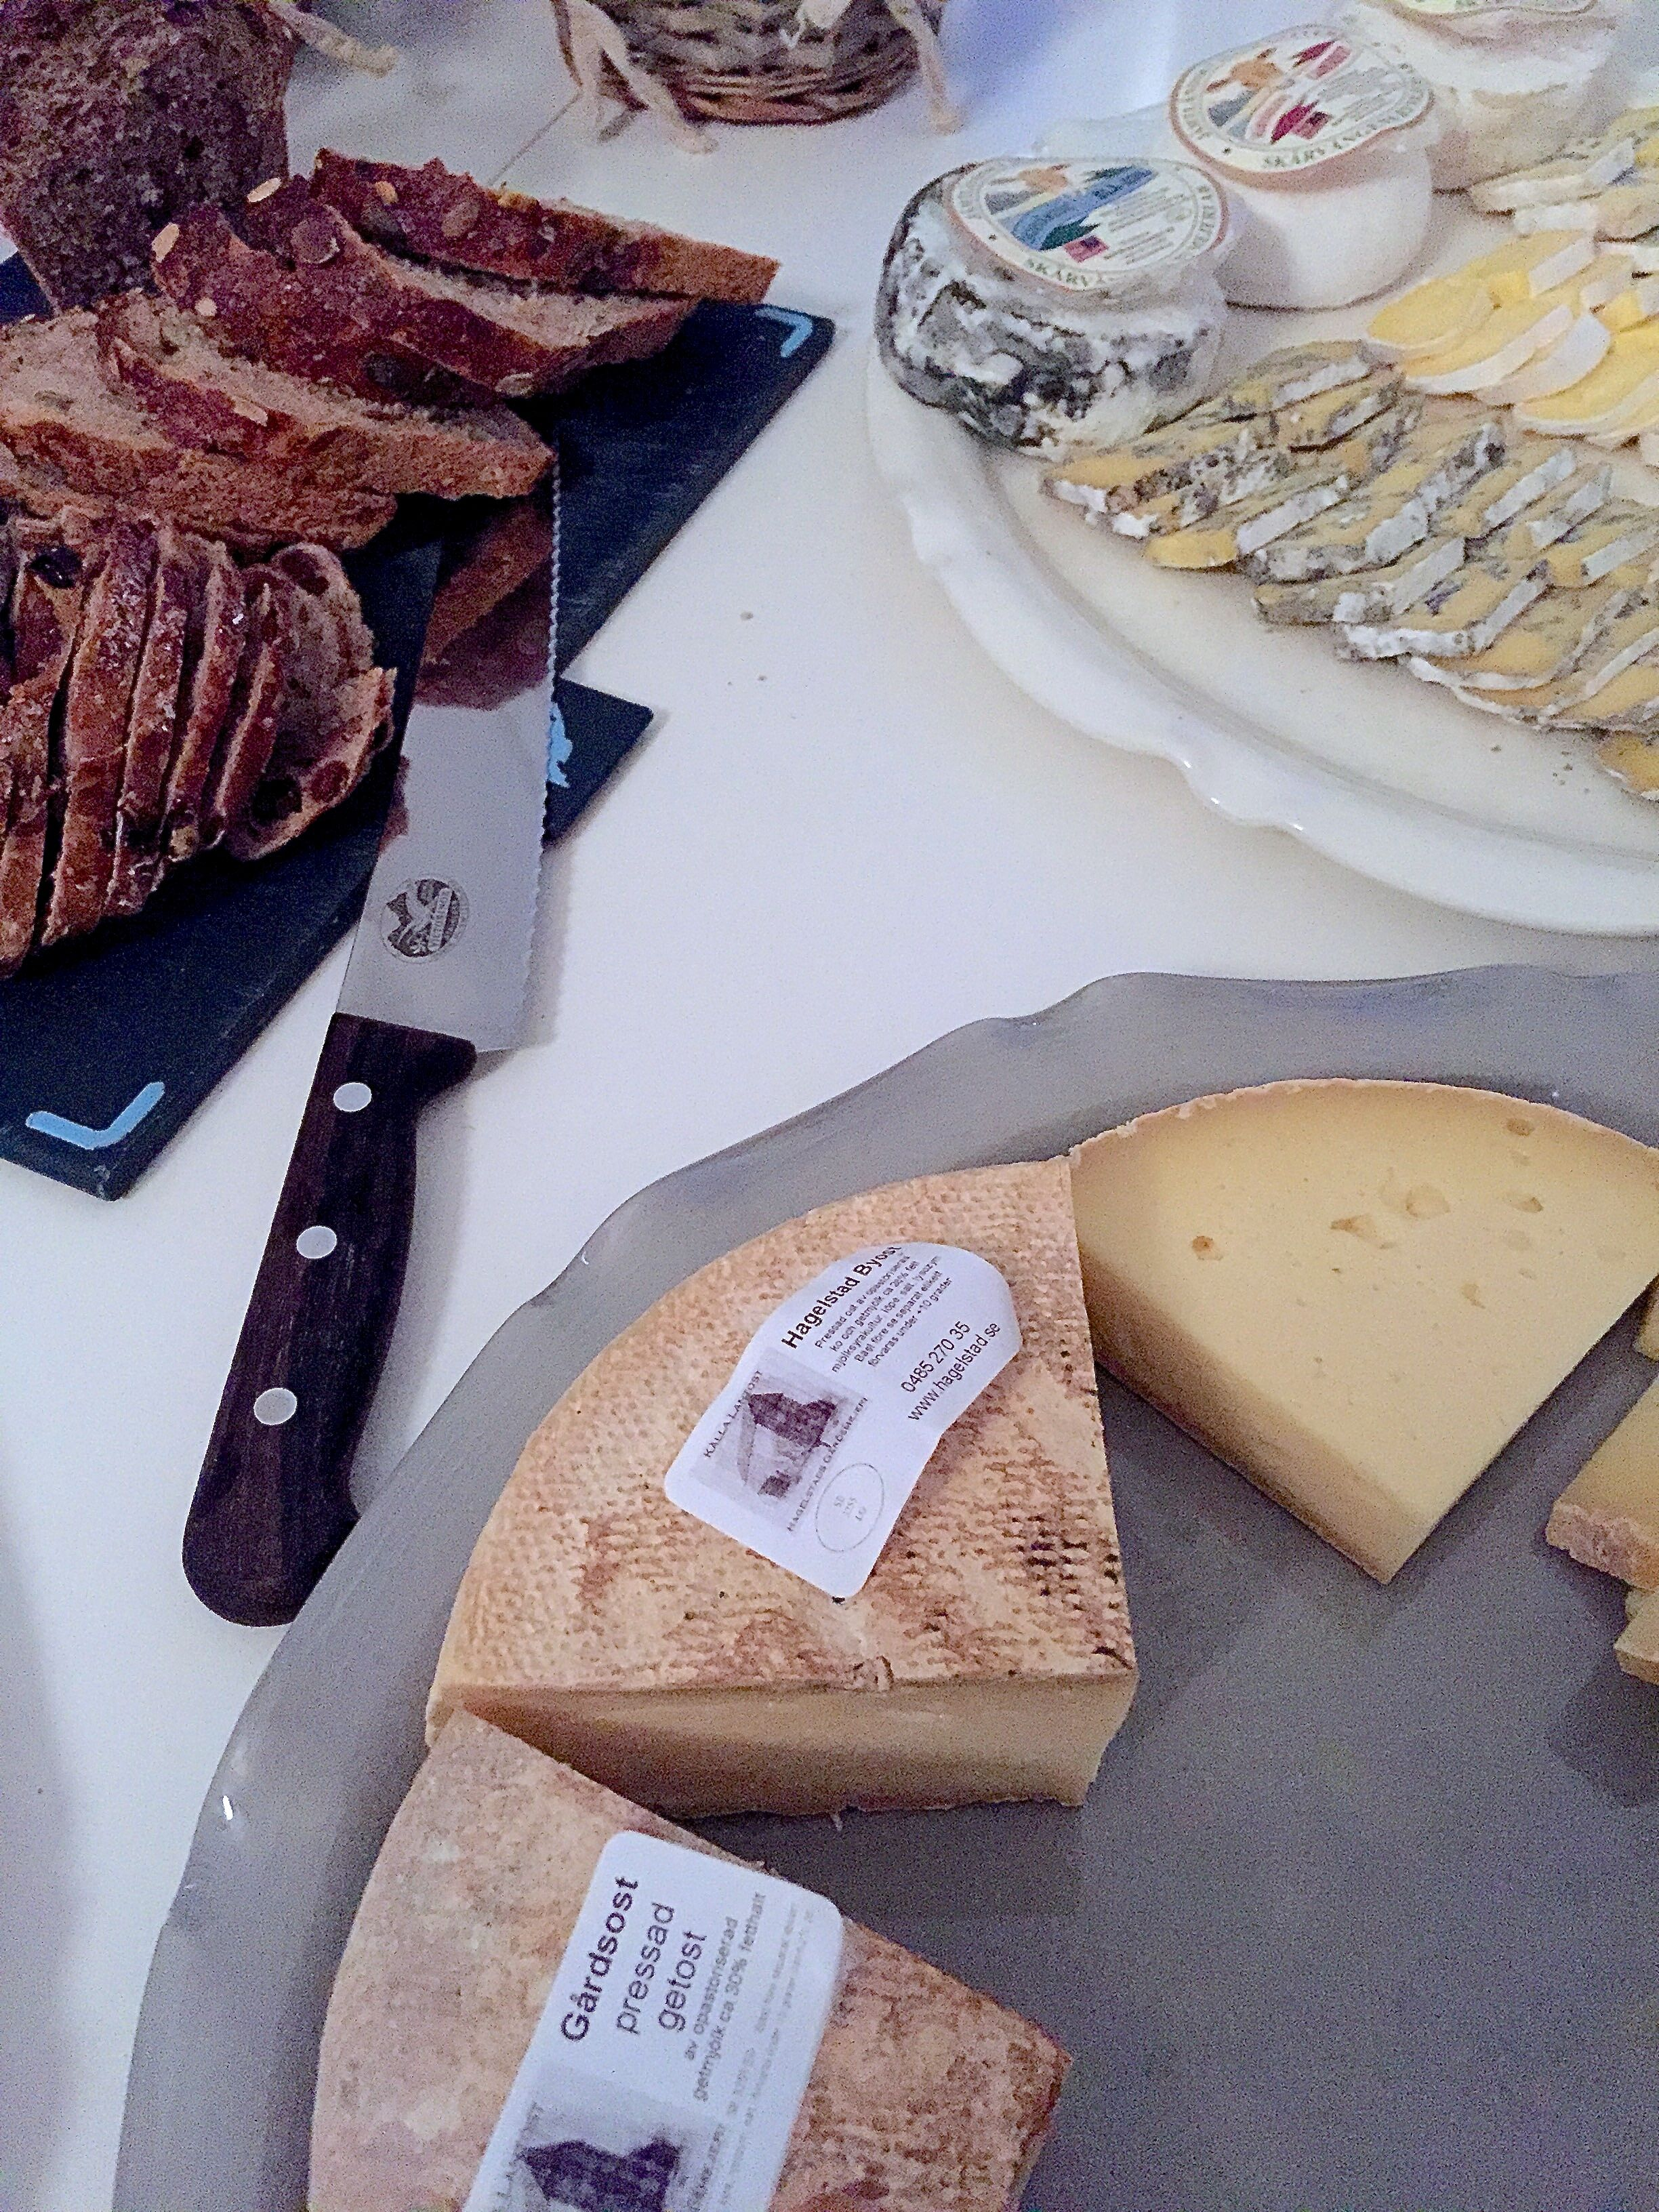 Mathantverk ostar och bröd